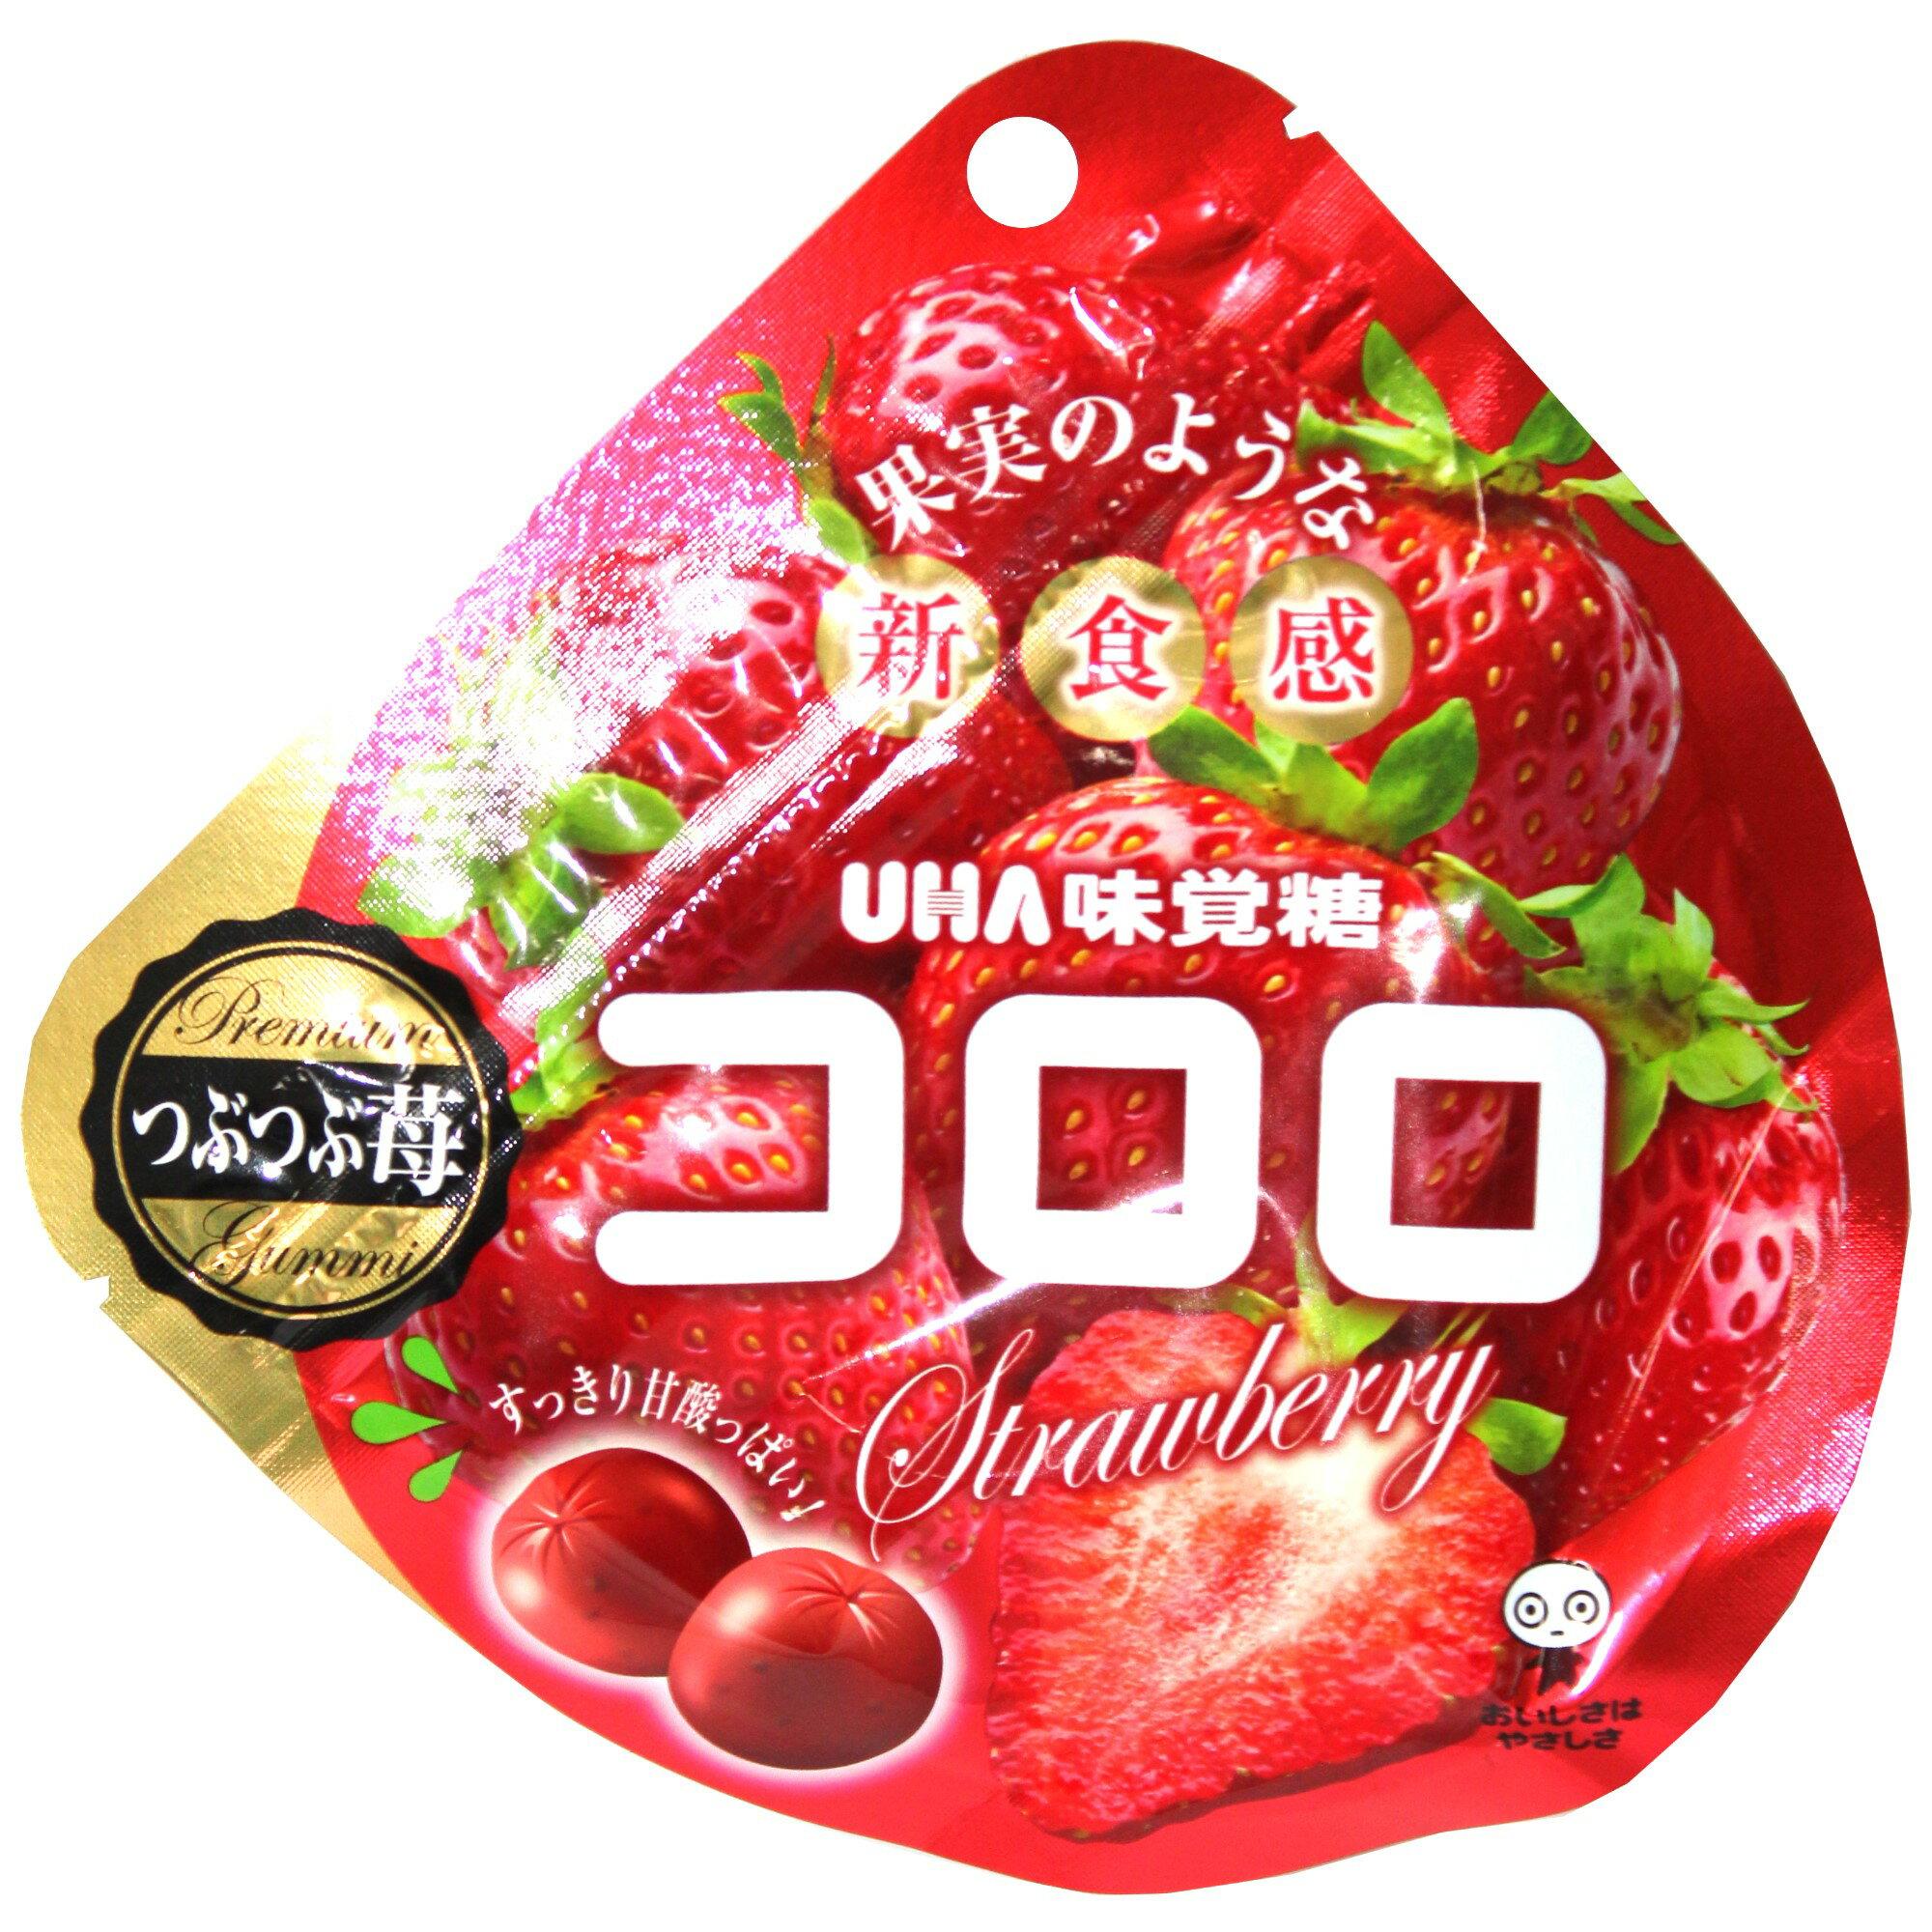 UHA 味覺糖 Kororo 可洛洛草莓Q糖 40g